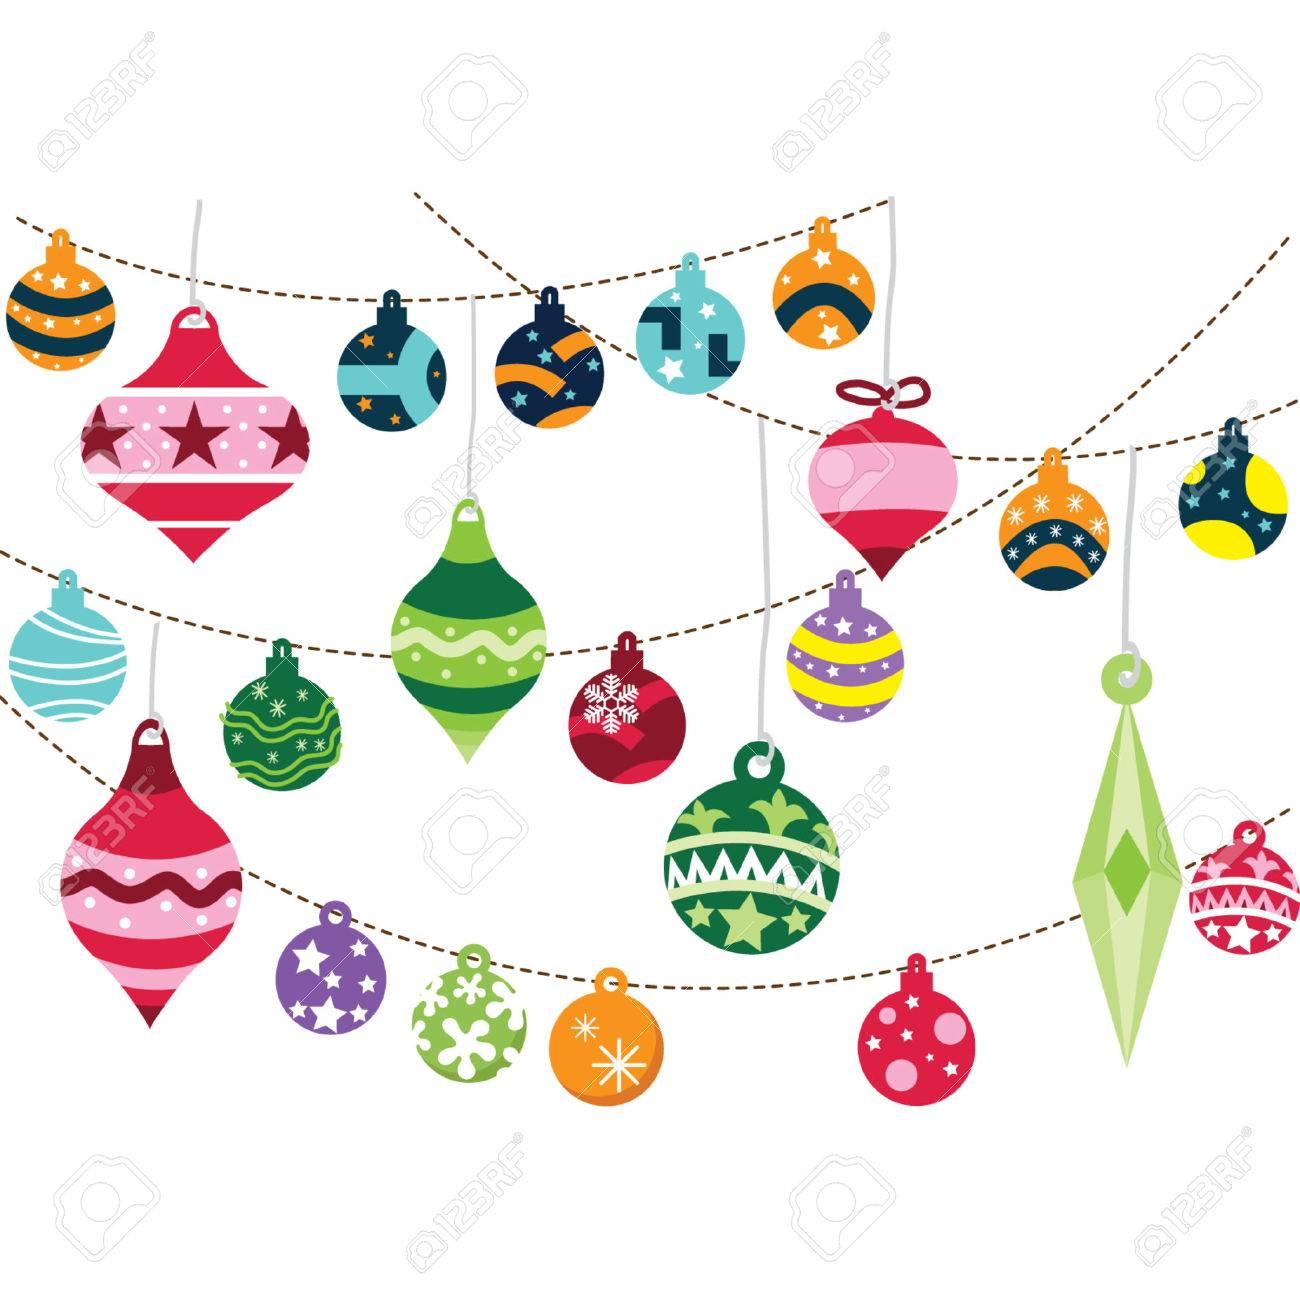 Christmas Ornament Vector.Christmas Ornaments